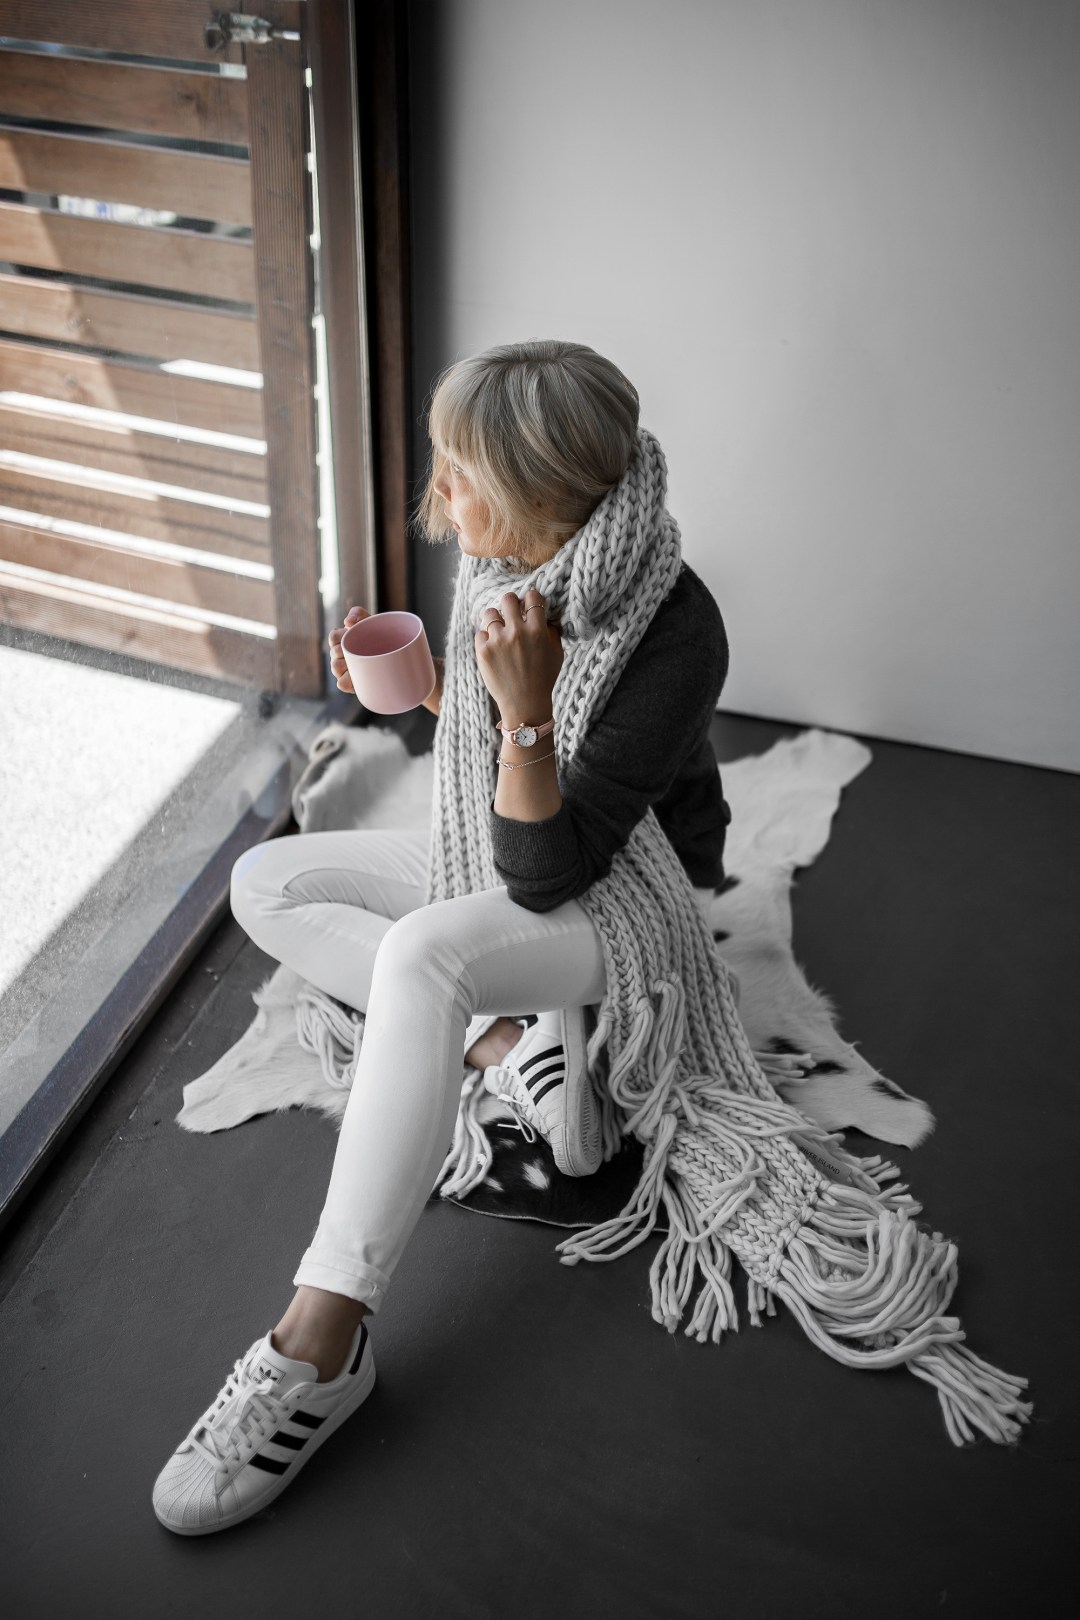 chunky-scarf-adidas-superstar-coffee-morning-inspiration-4-copy